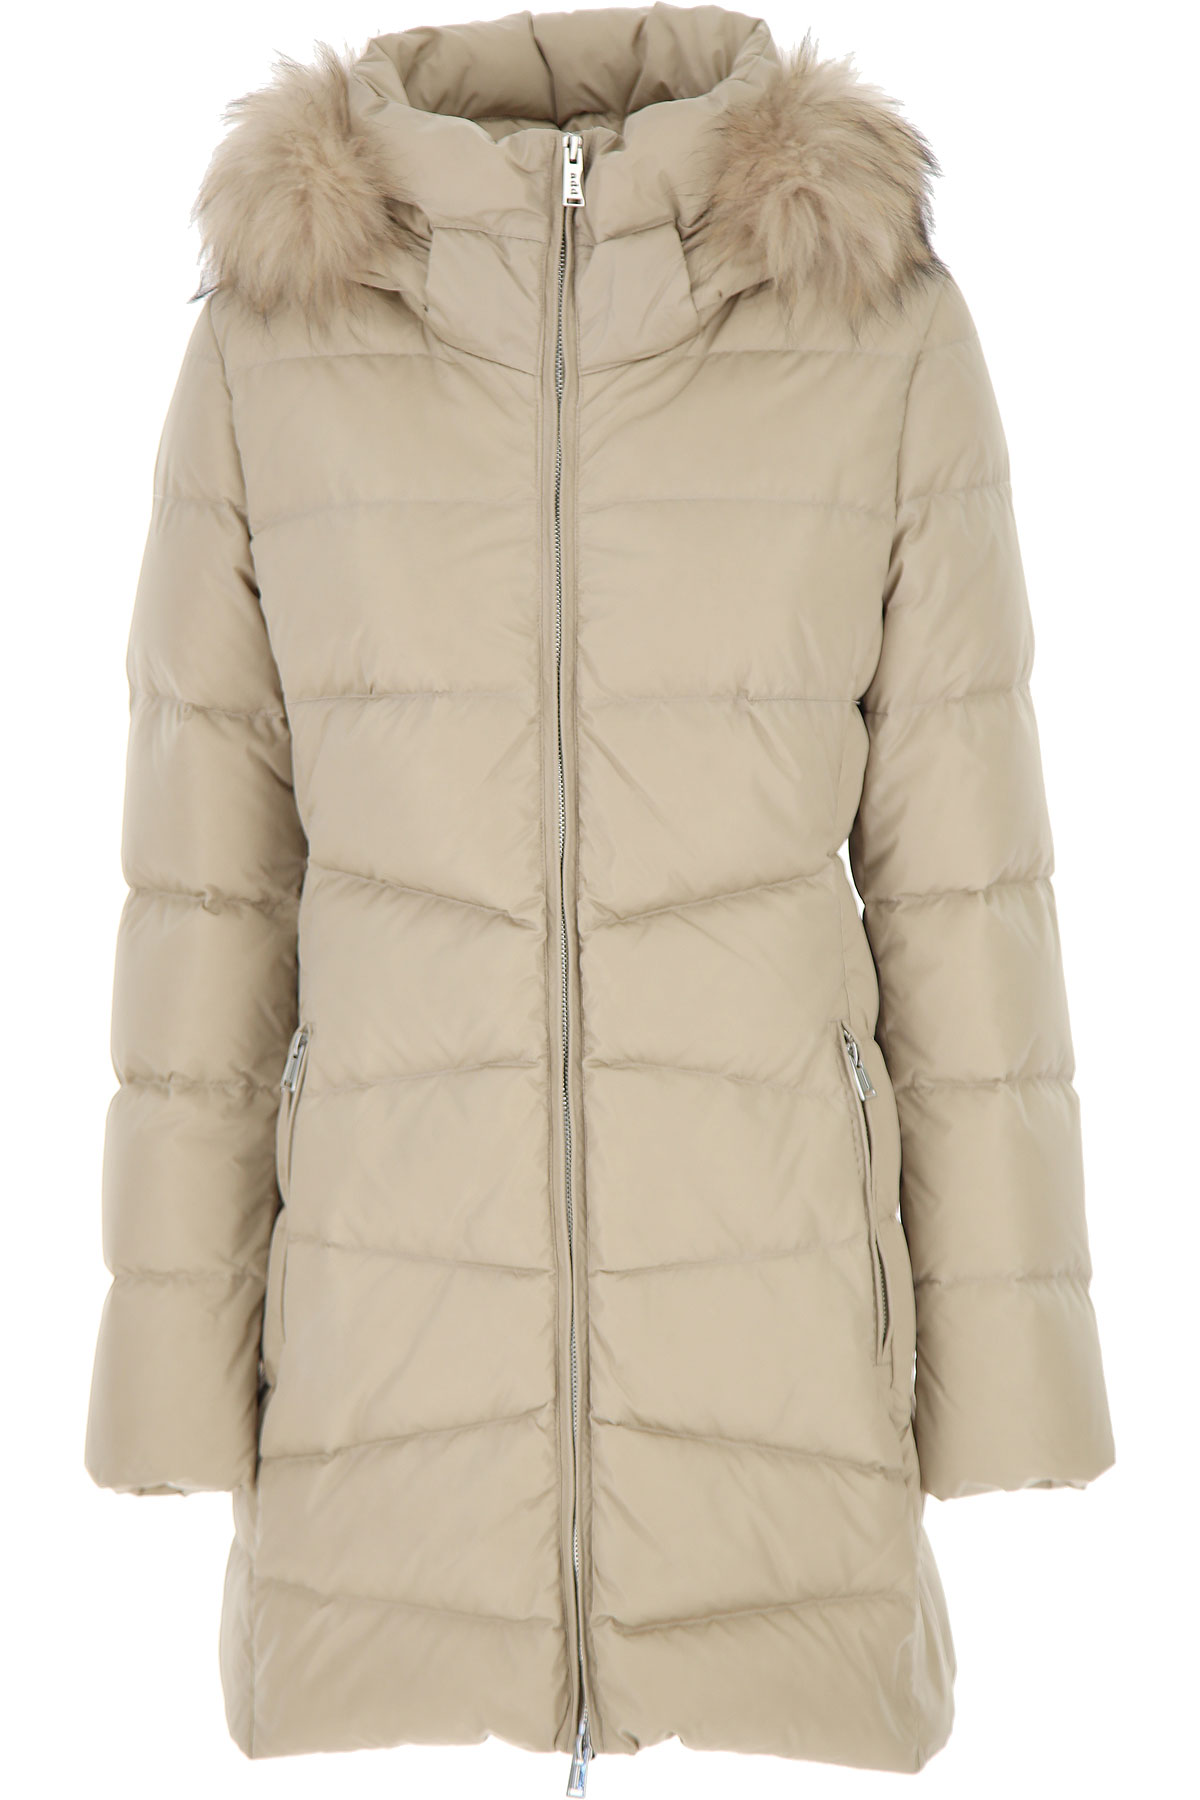 ADD Down Jacket for Women, Puffer Ski Jacket, Beige, polyamide, 2019, 10 4